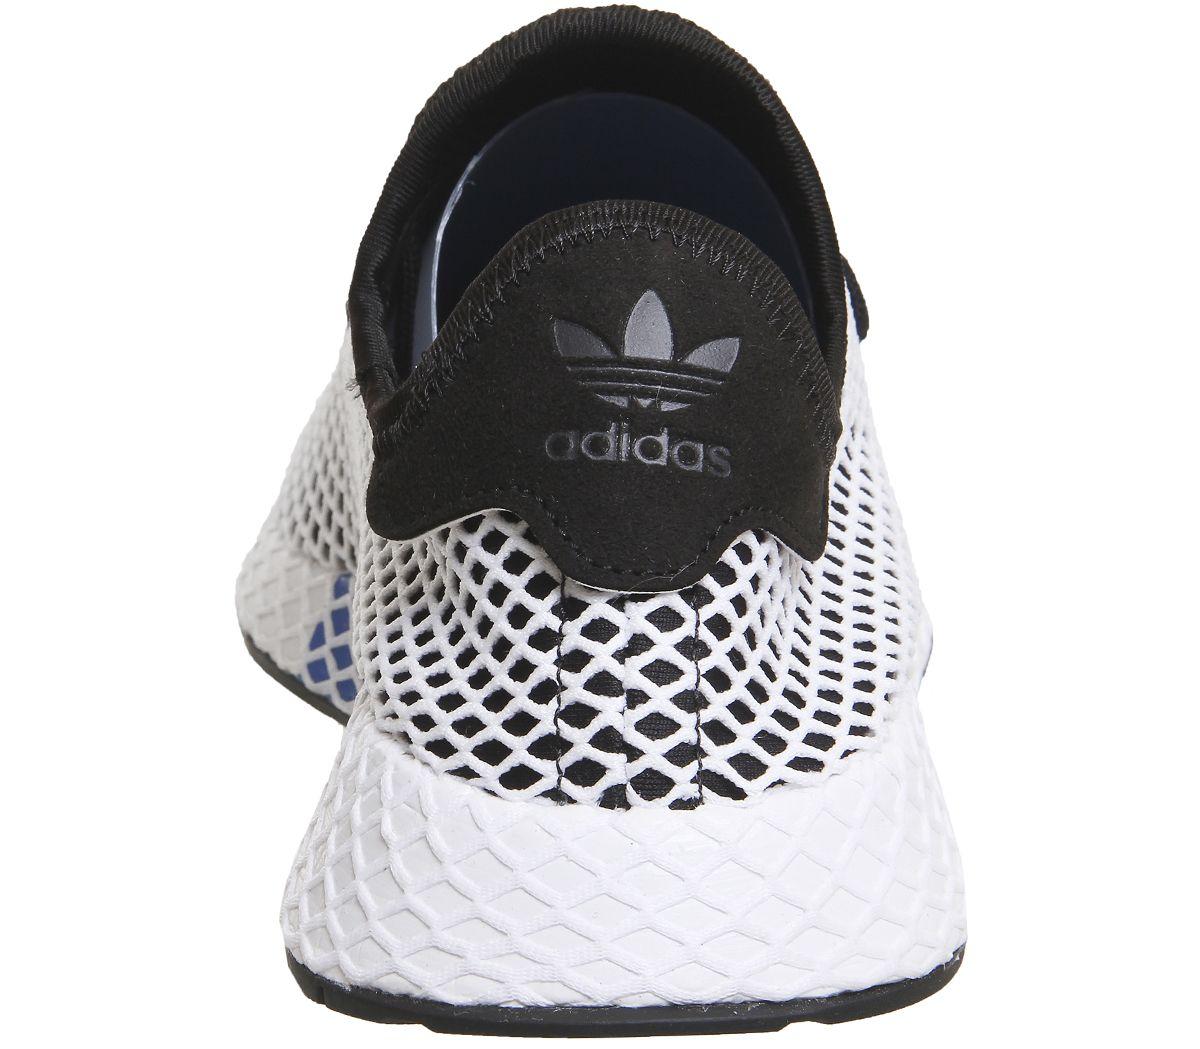 7e76cf8e7 Mens Adidas Deerupt Trainers Core Black White Trainers Shoes